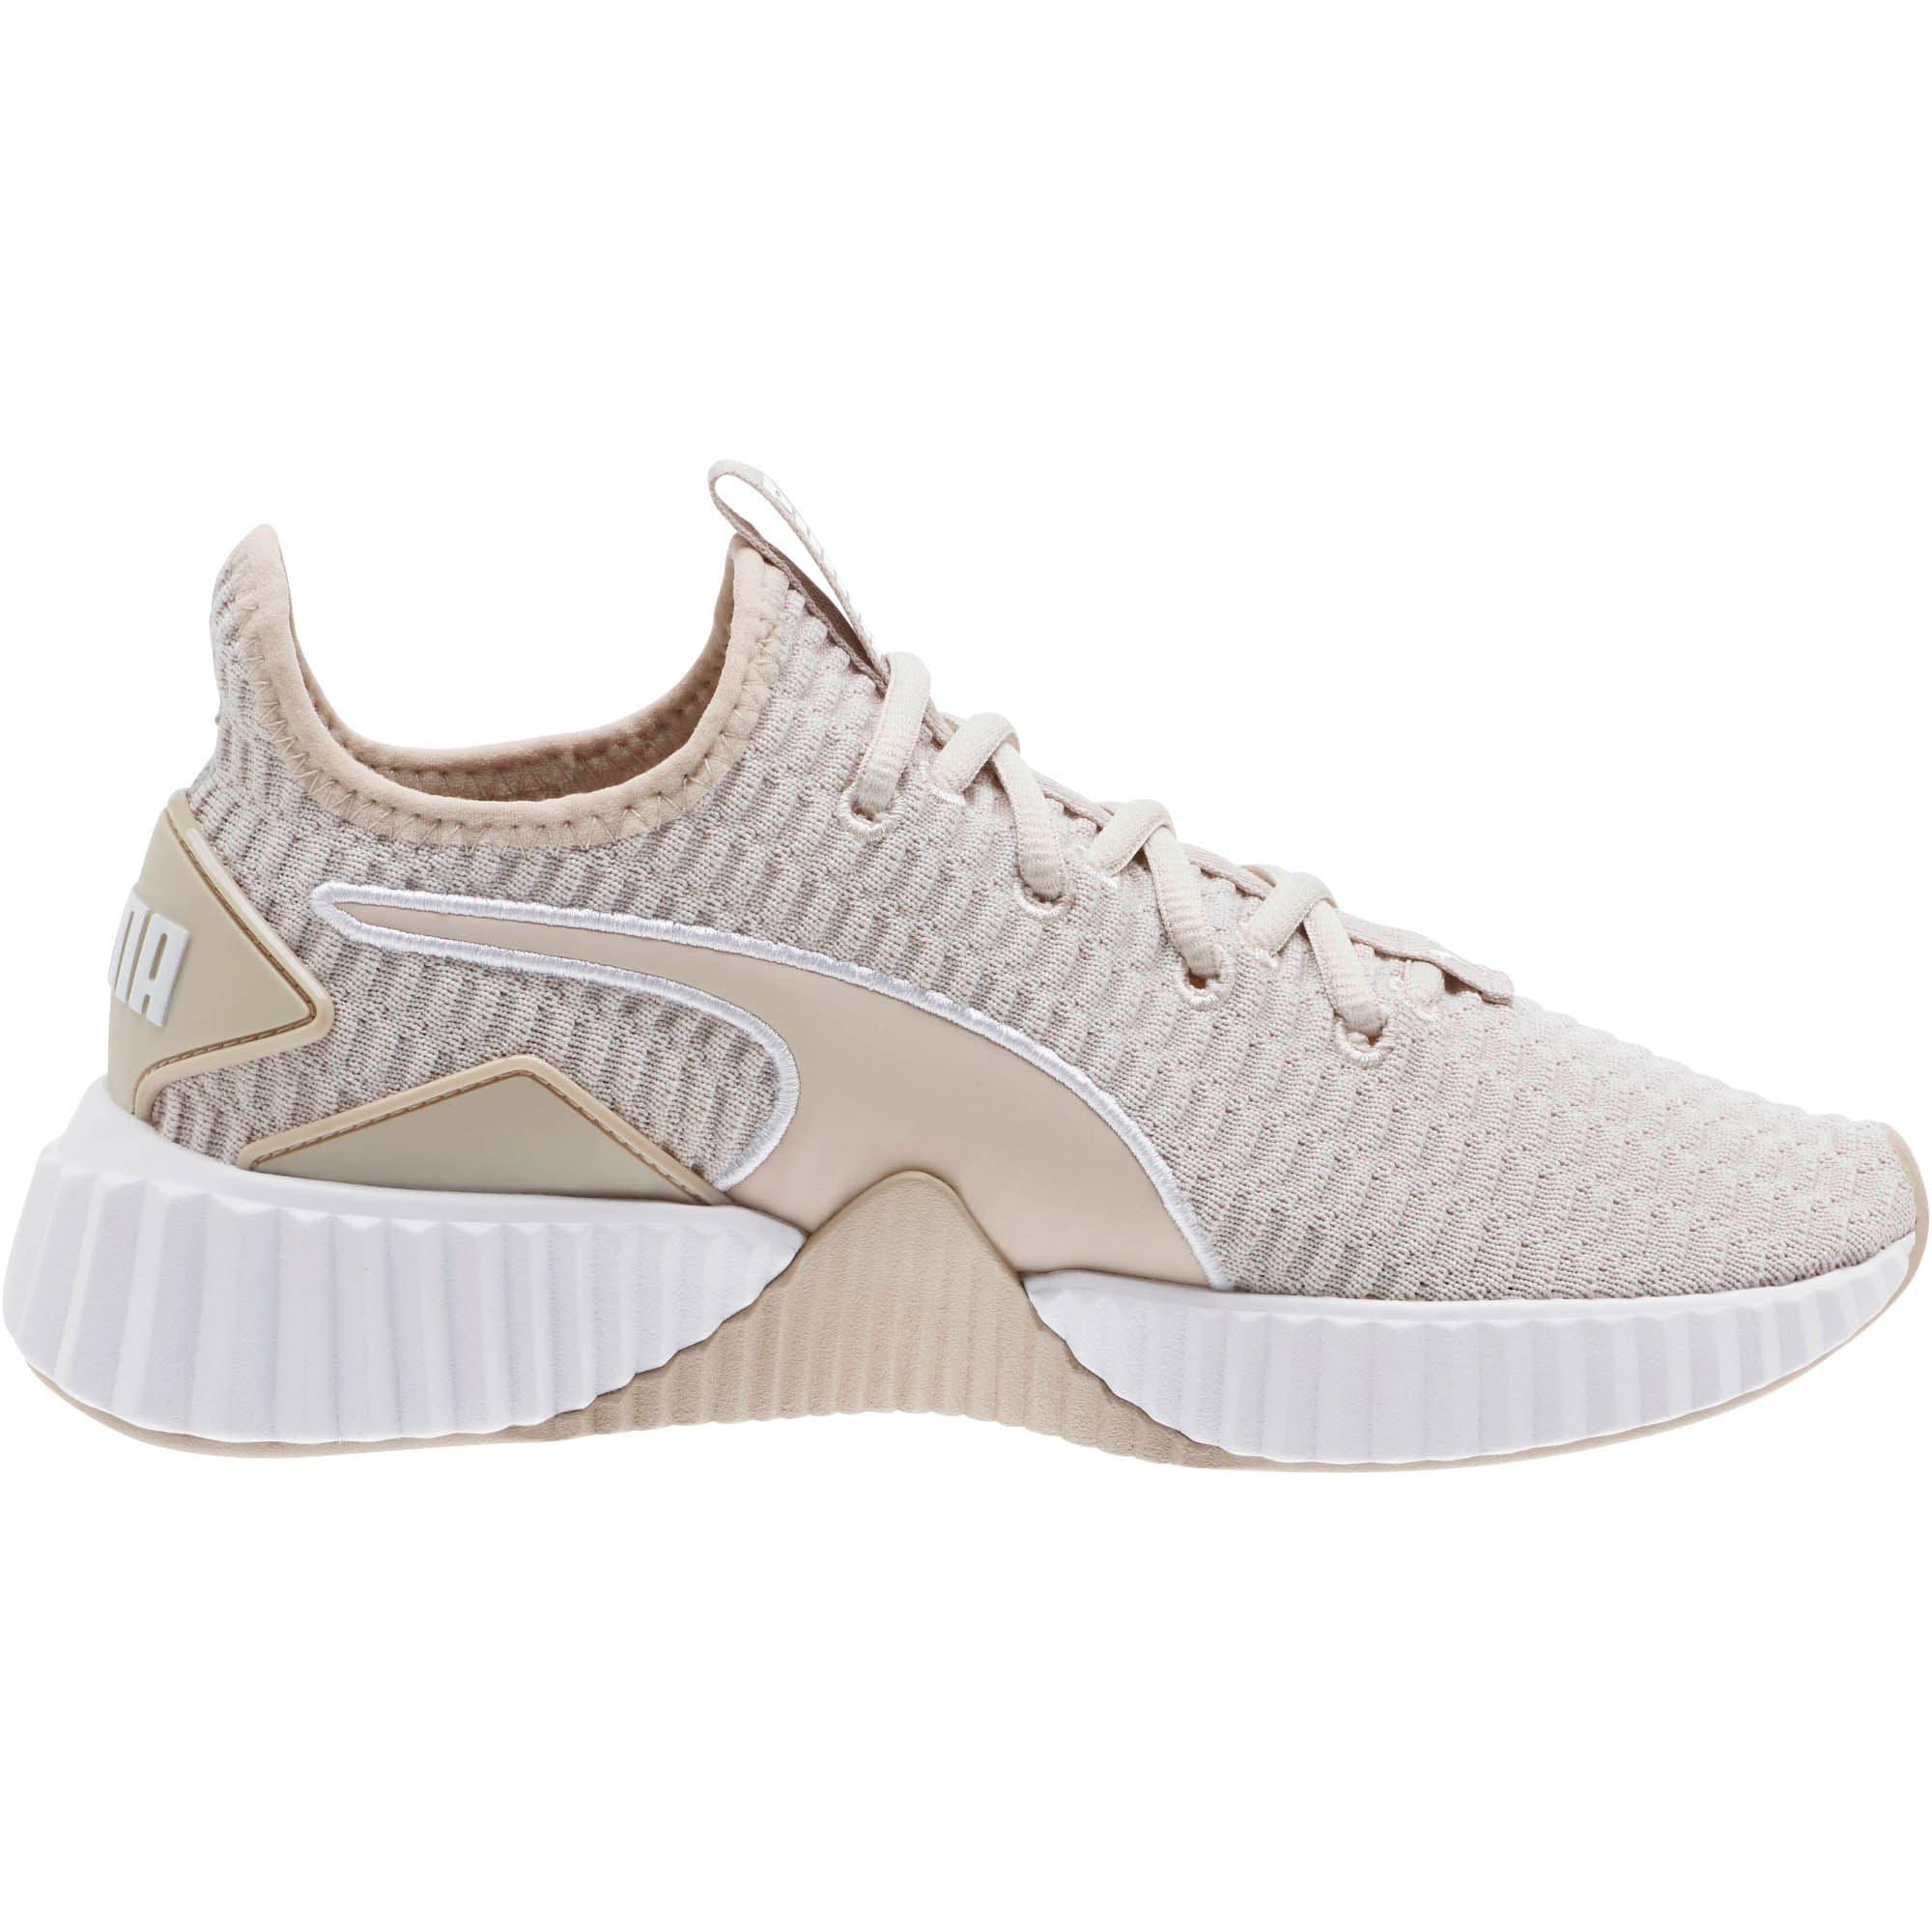 Thumbnail 4 of Defy Women's Training Shoes, Silver Gray-Puma White, medium